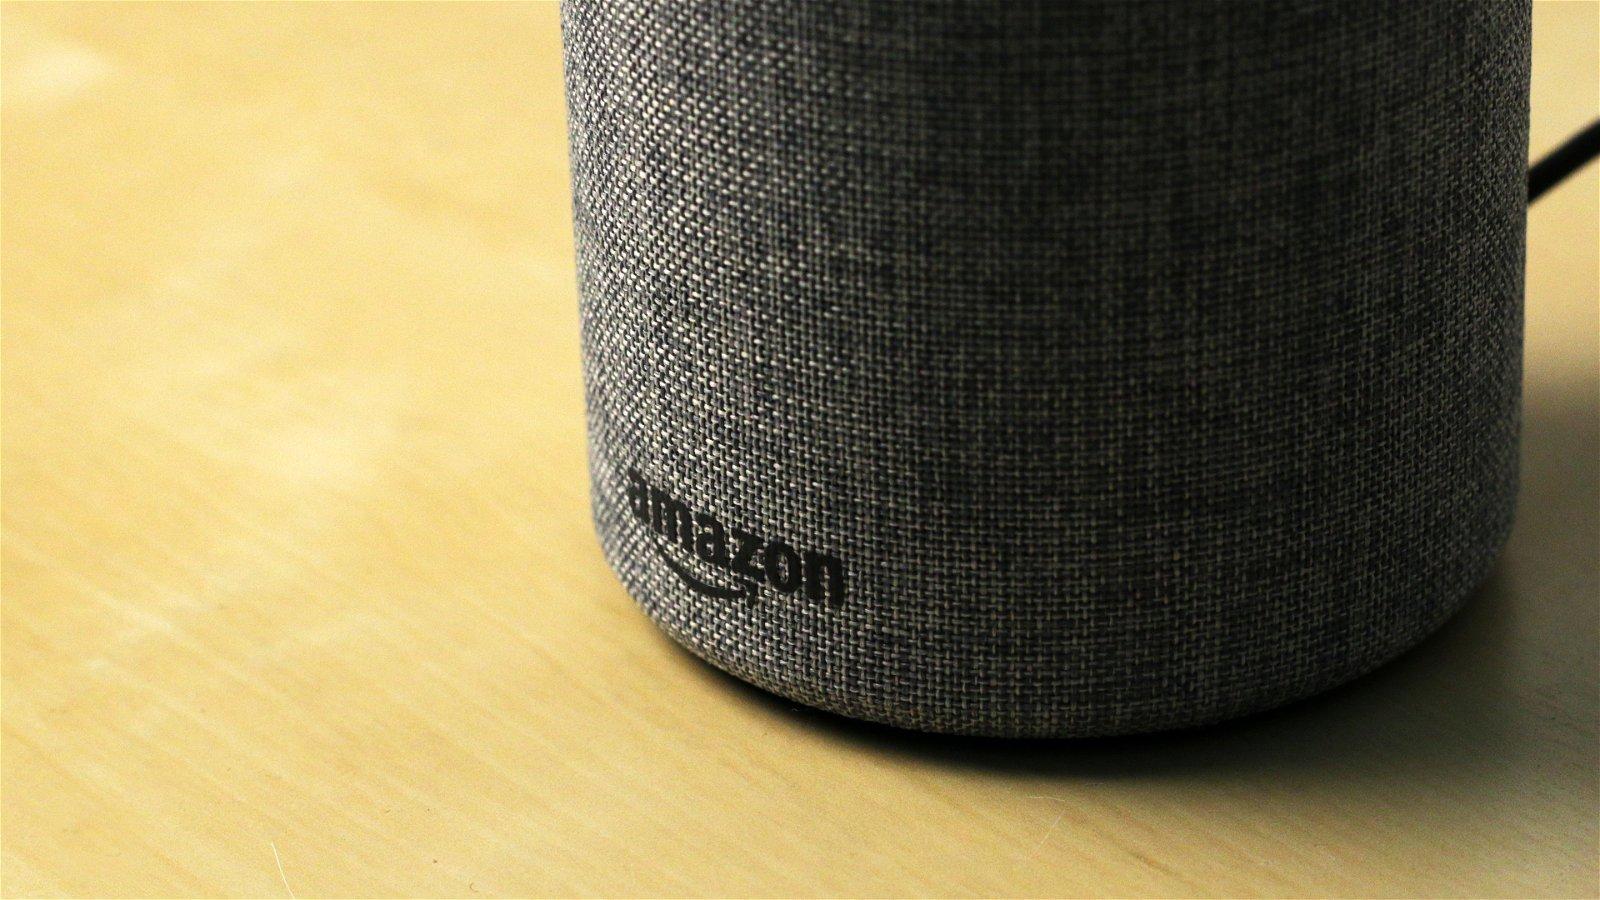 Amazon Echo 2 (Hardware) Review